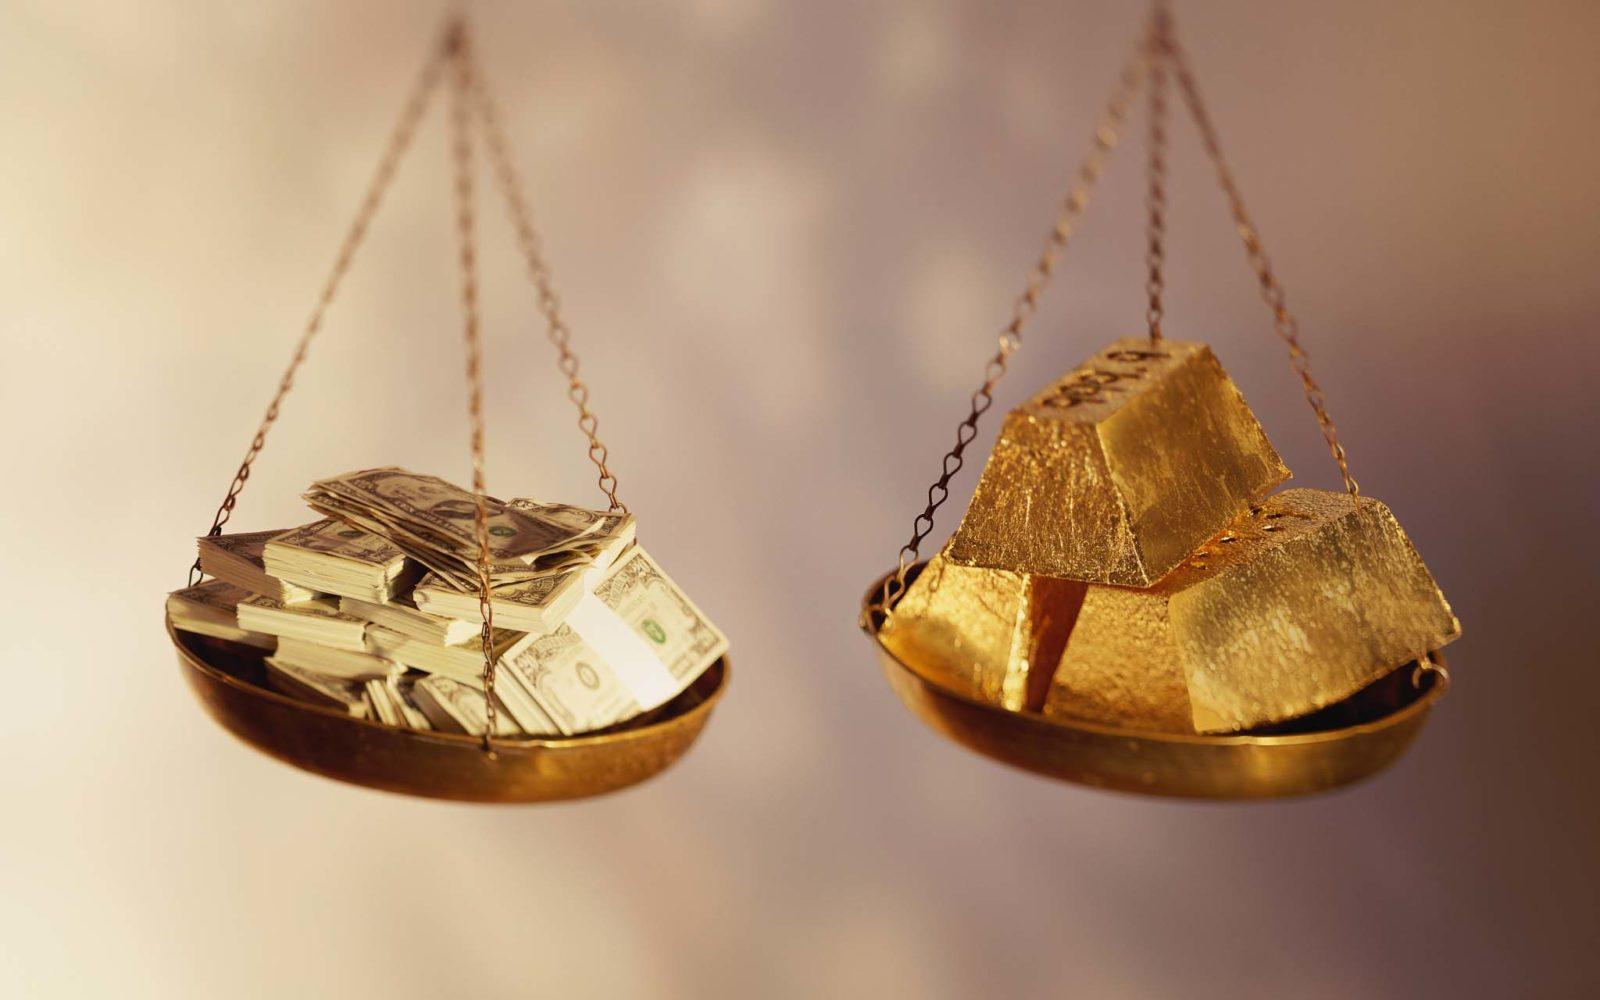 металлы дороже золота